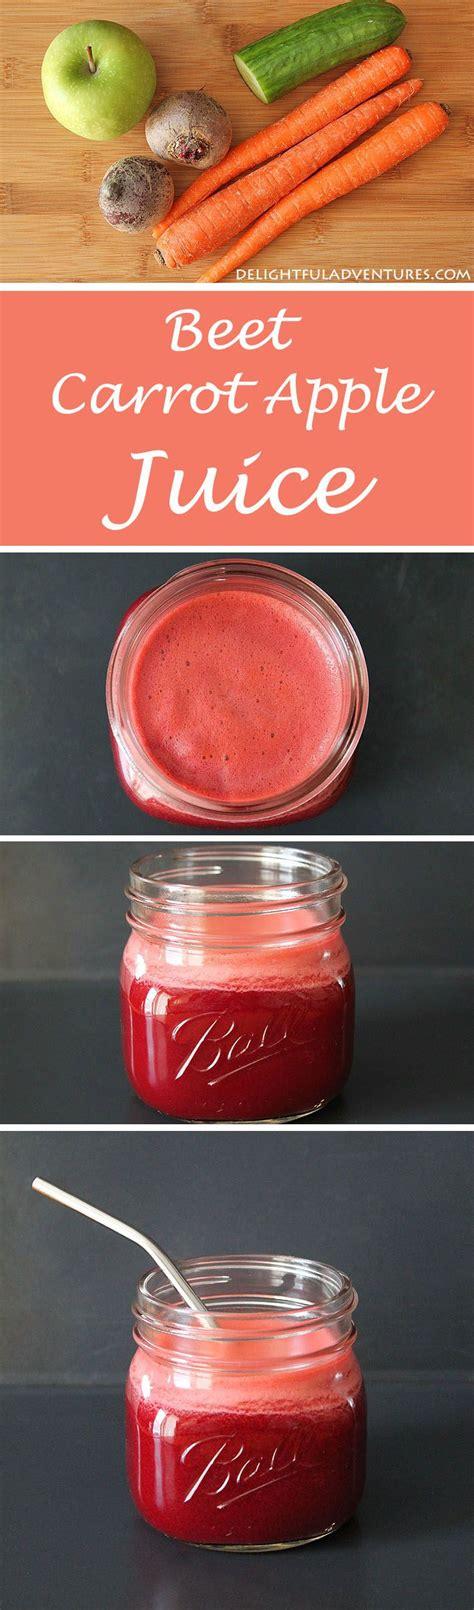 Carrot Apple Beet Juice Detox by Best 25 Detox Juices Ideas Only On